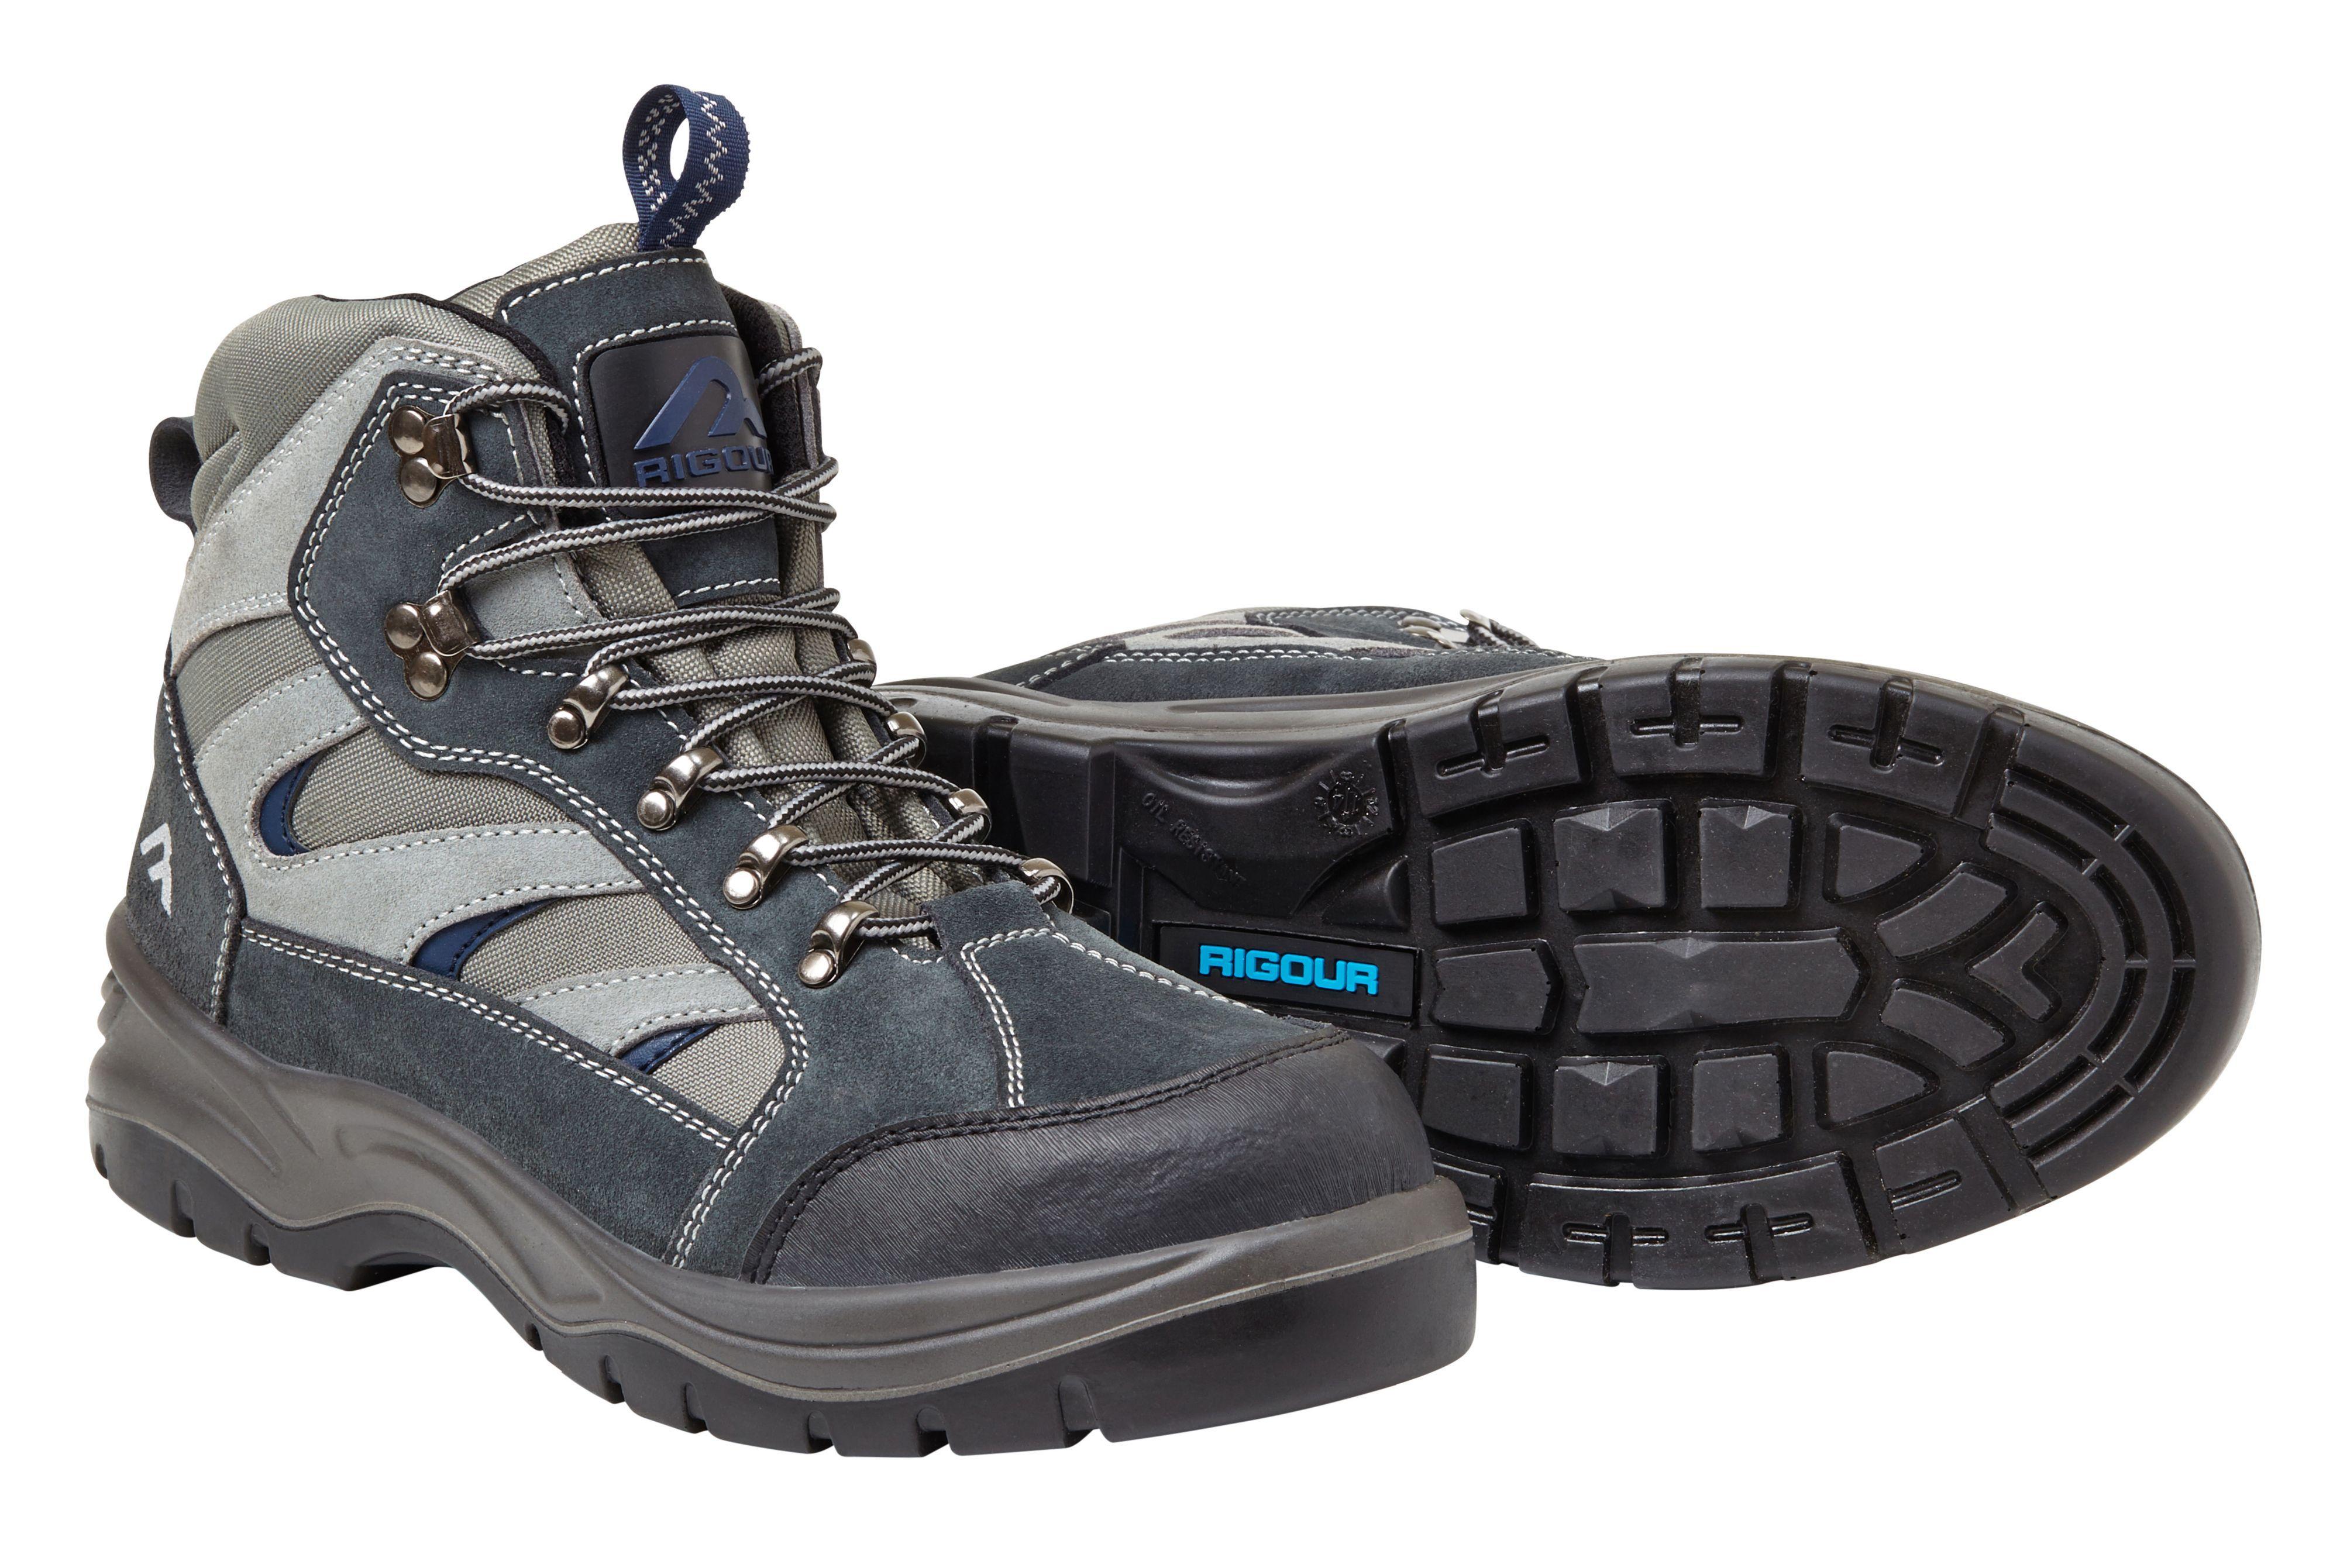 Rigour Grey & Blue Hiker Boots, Size 9